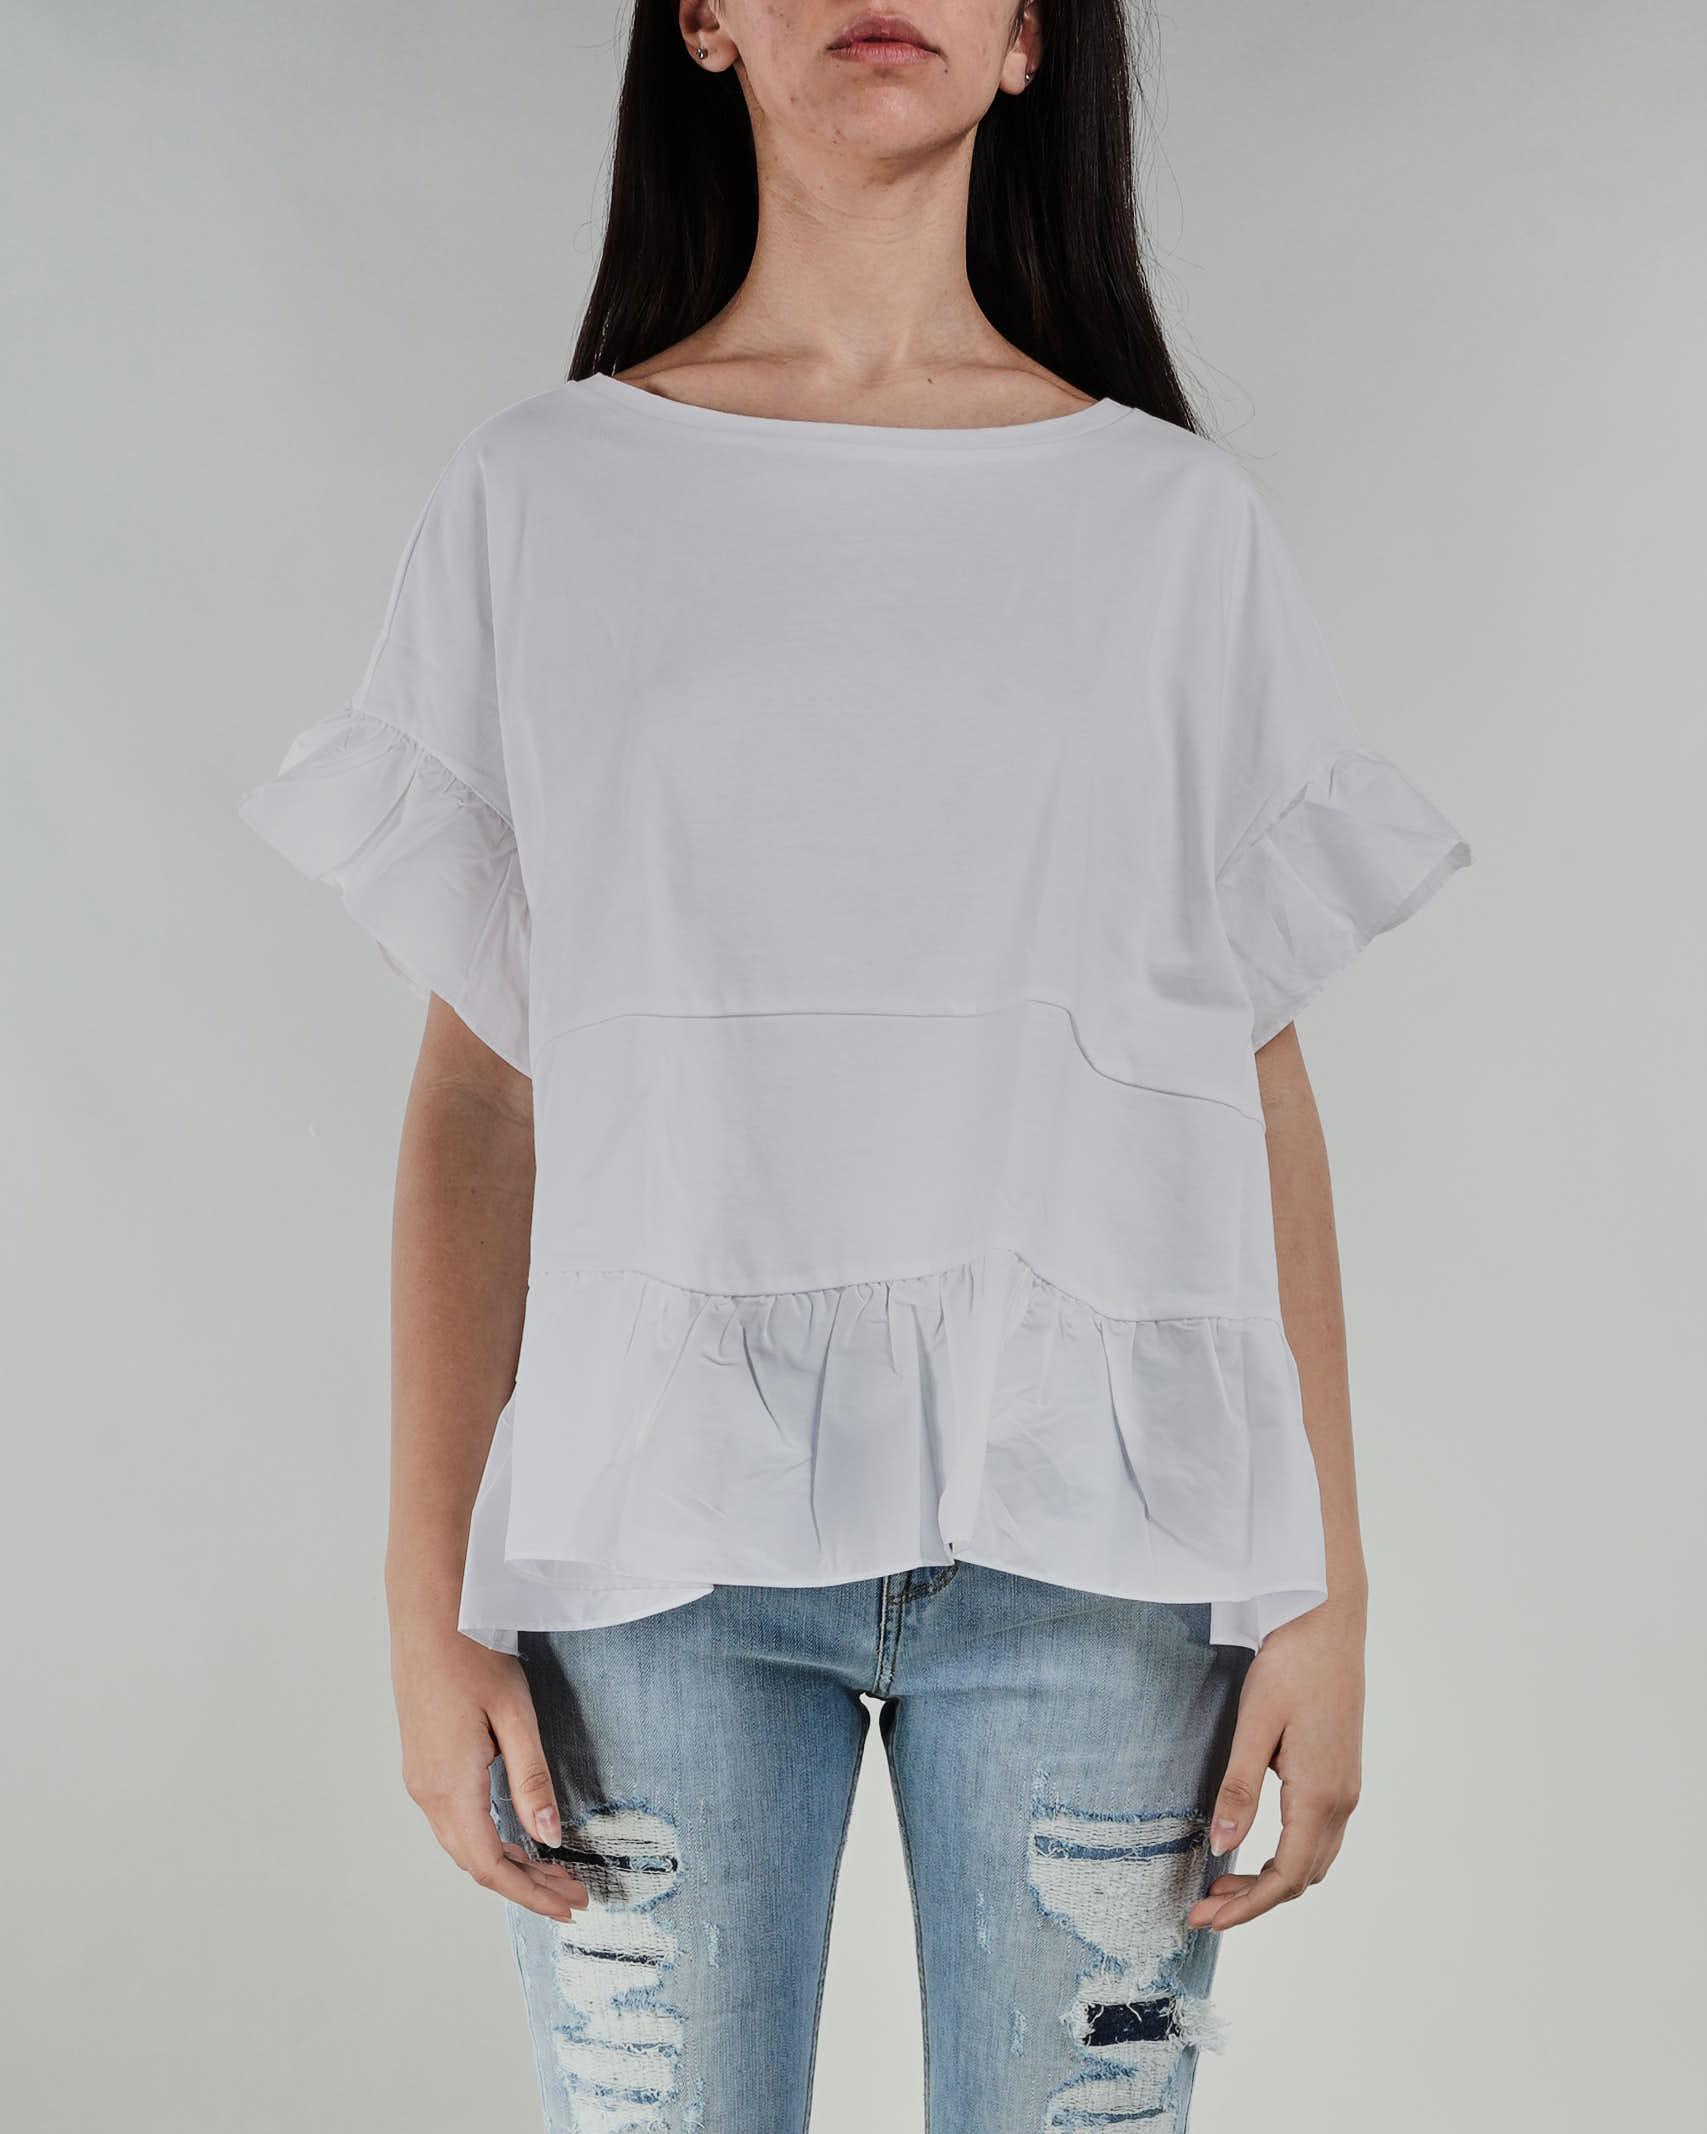 T-shirt con volant in popeline Twinset TWIN SET   T-shirt   TT24001